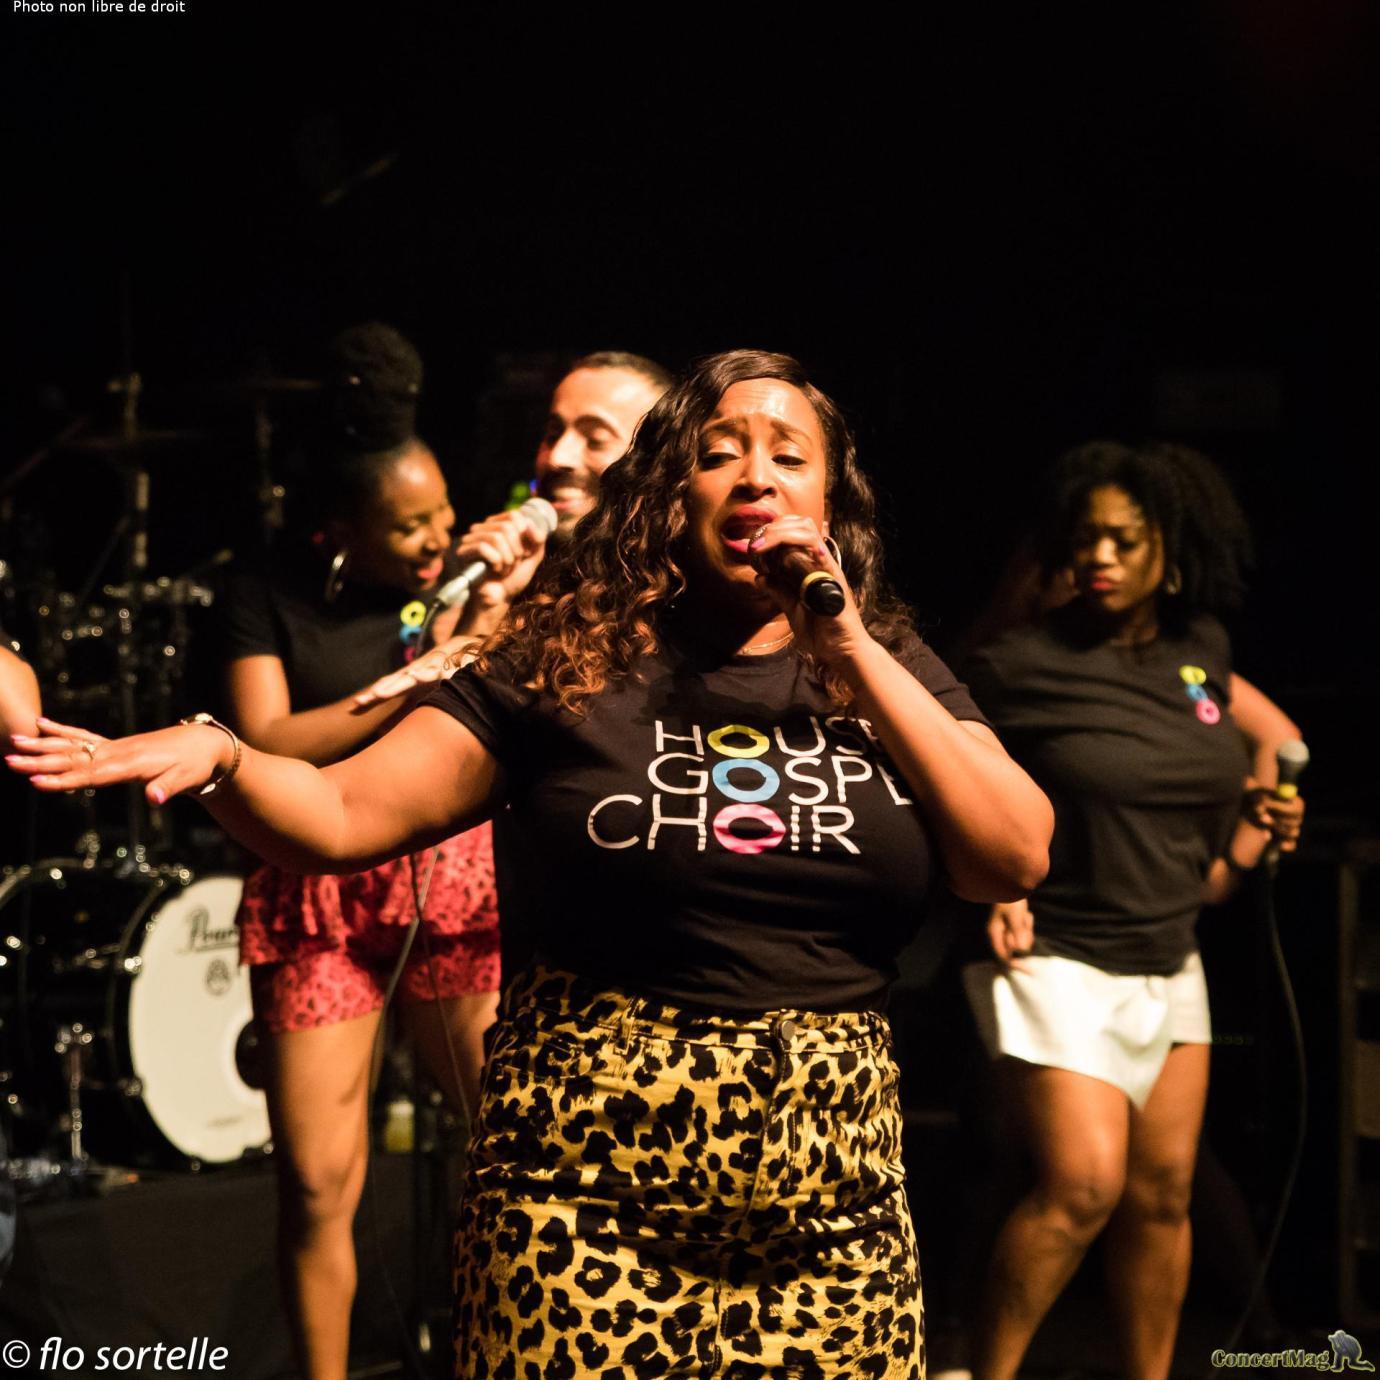 House Gospel Choir 1 1 - MaMa Festival & Convention, 2ème jour